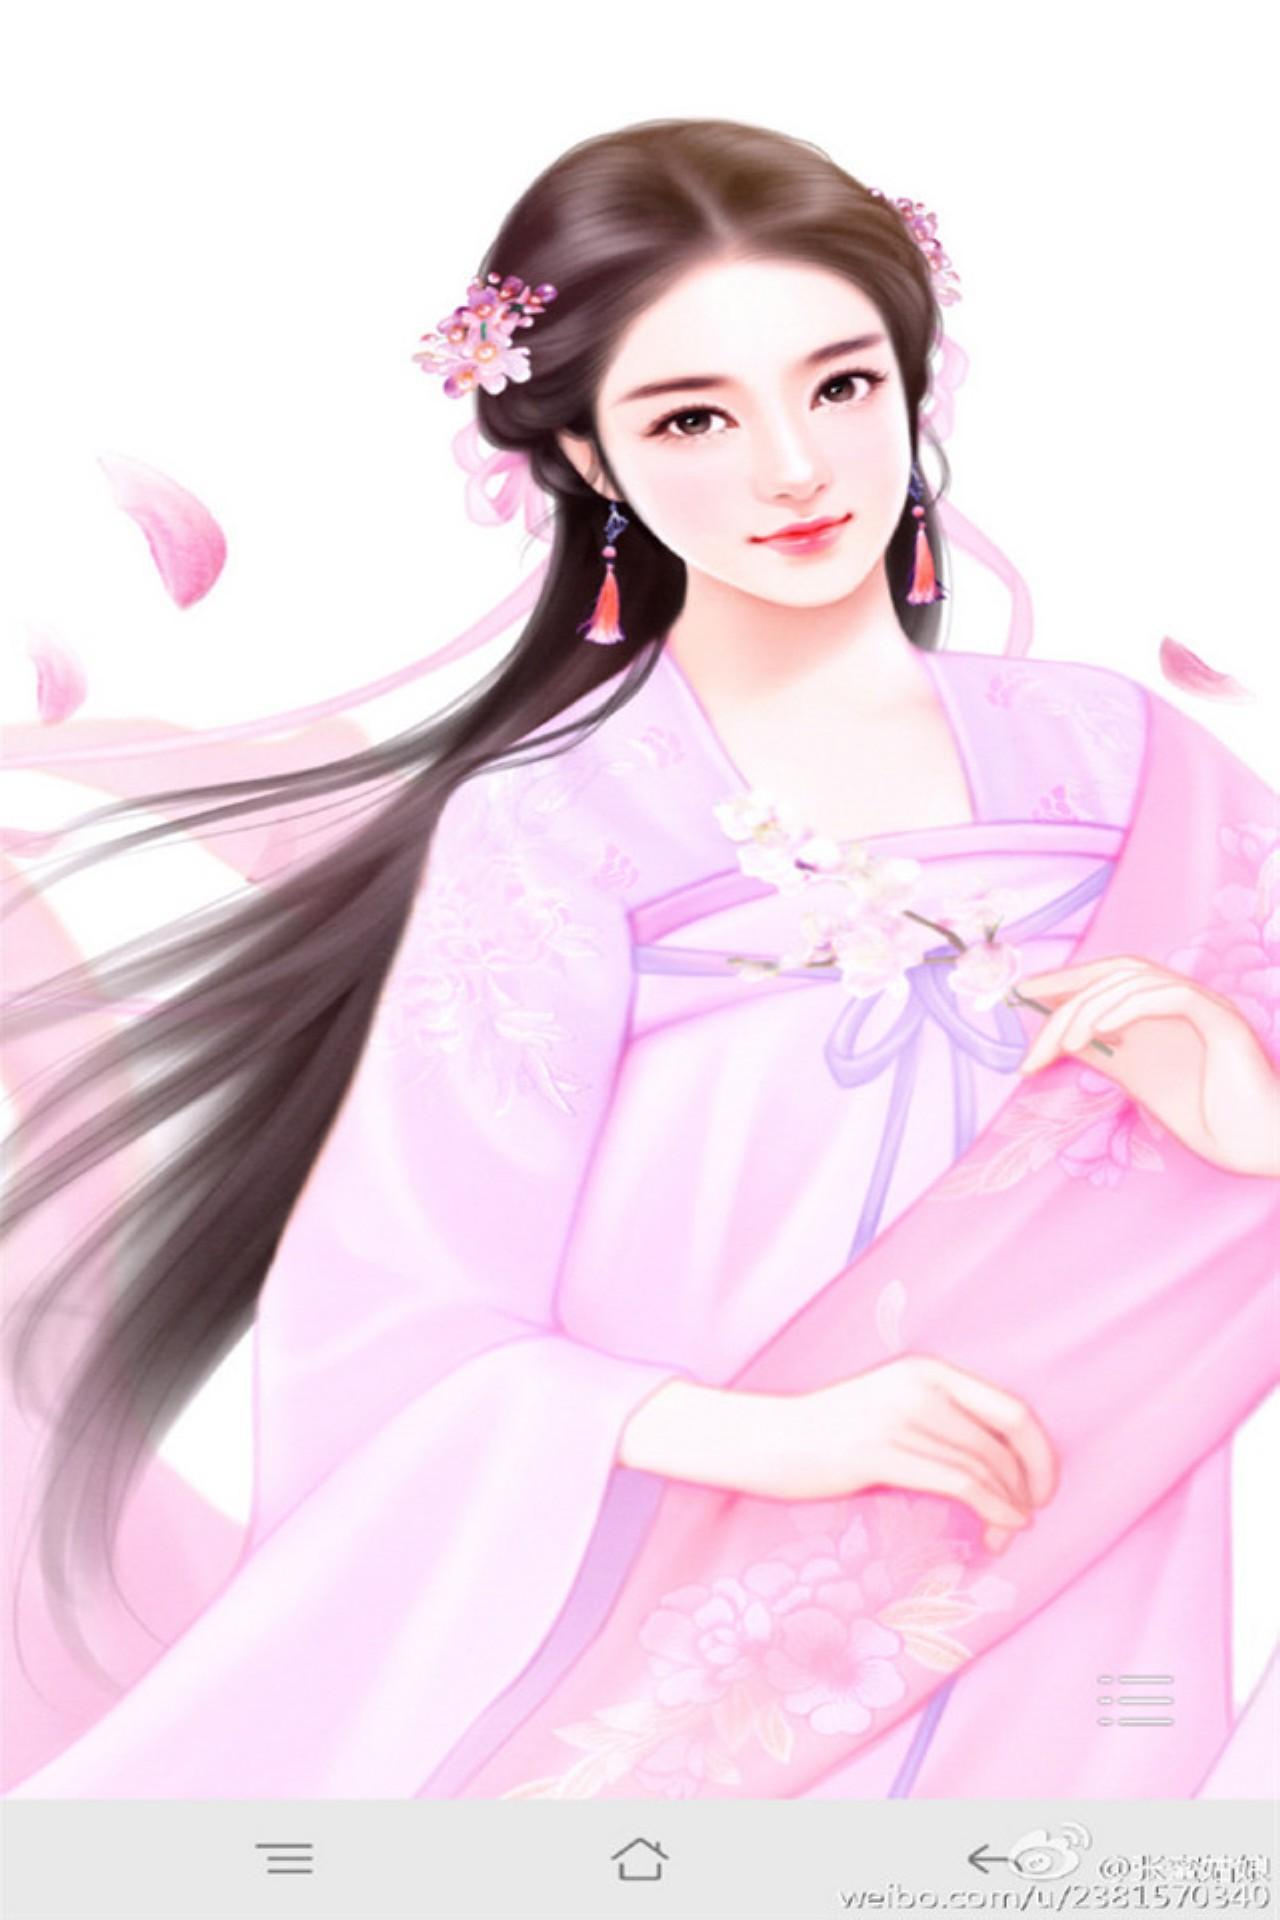 【1280x1920】小清新古装美女手绘图片手机壁纸